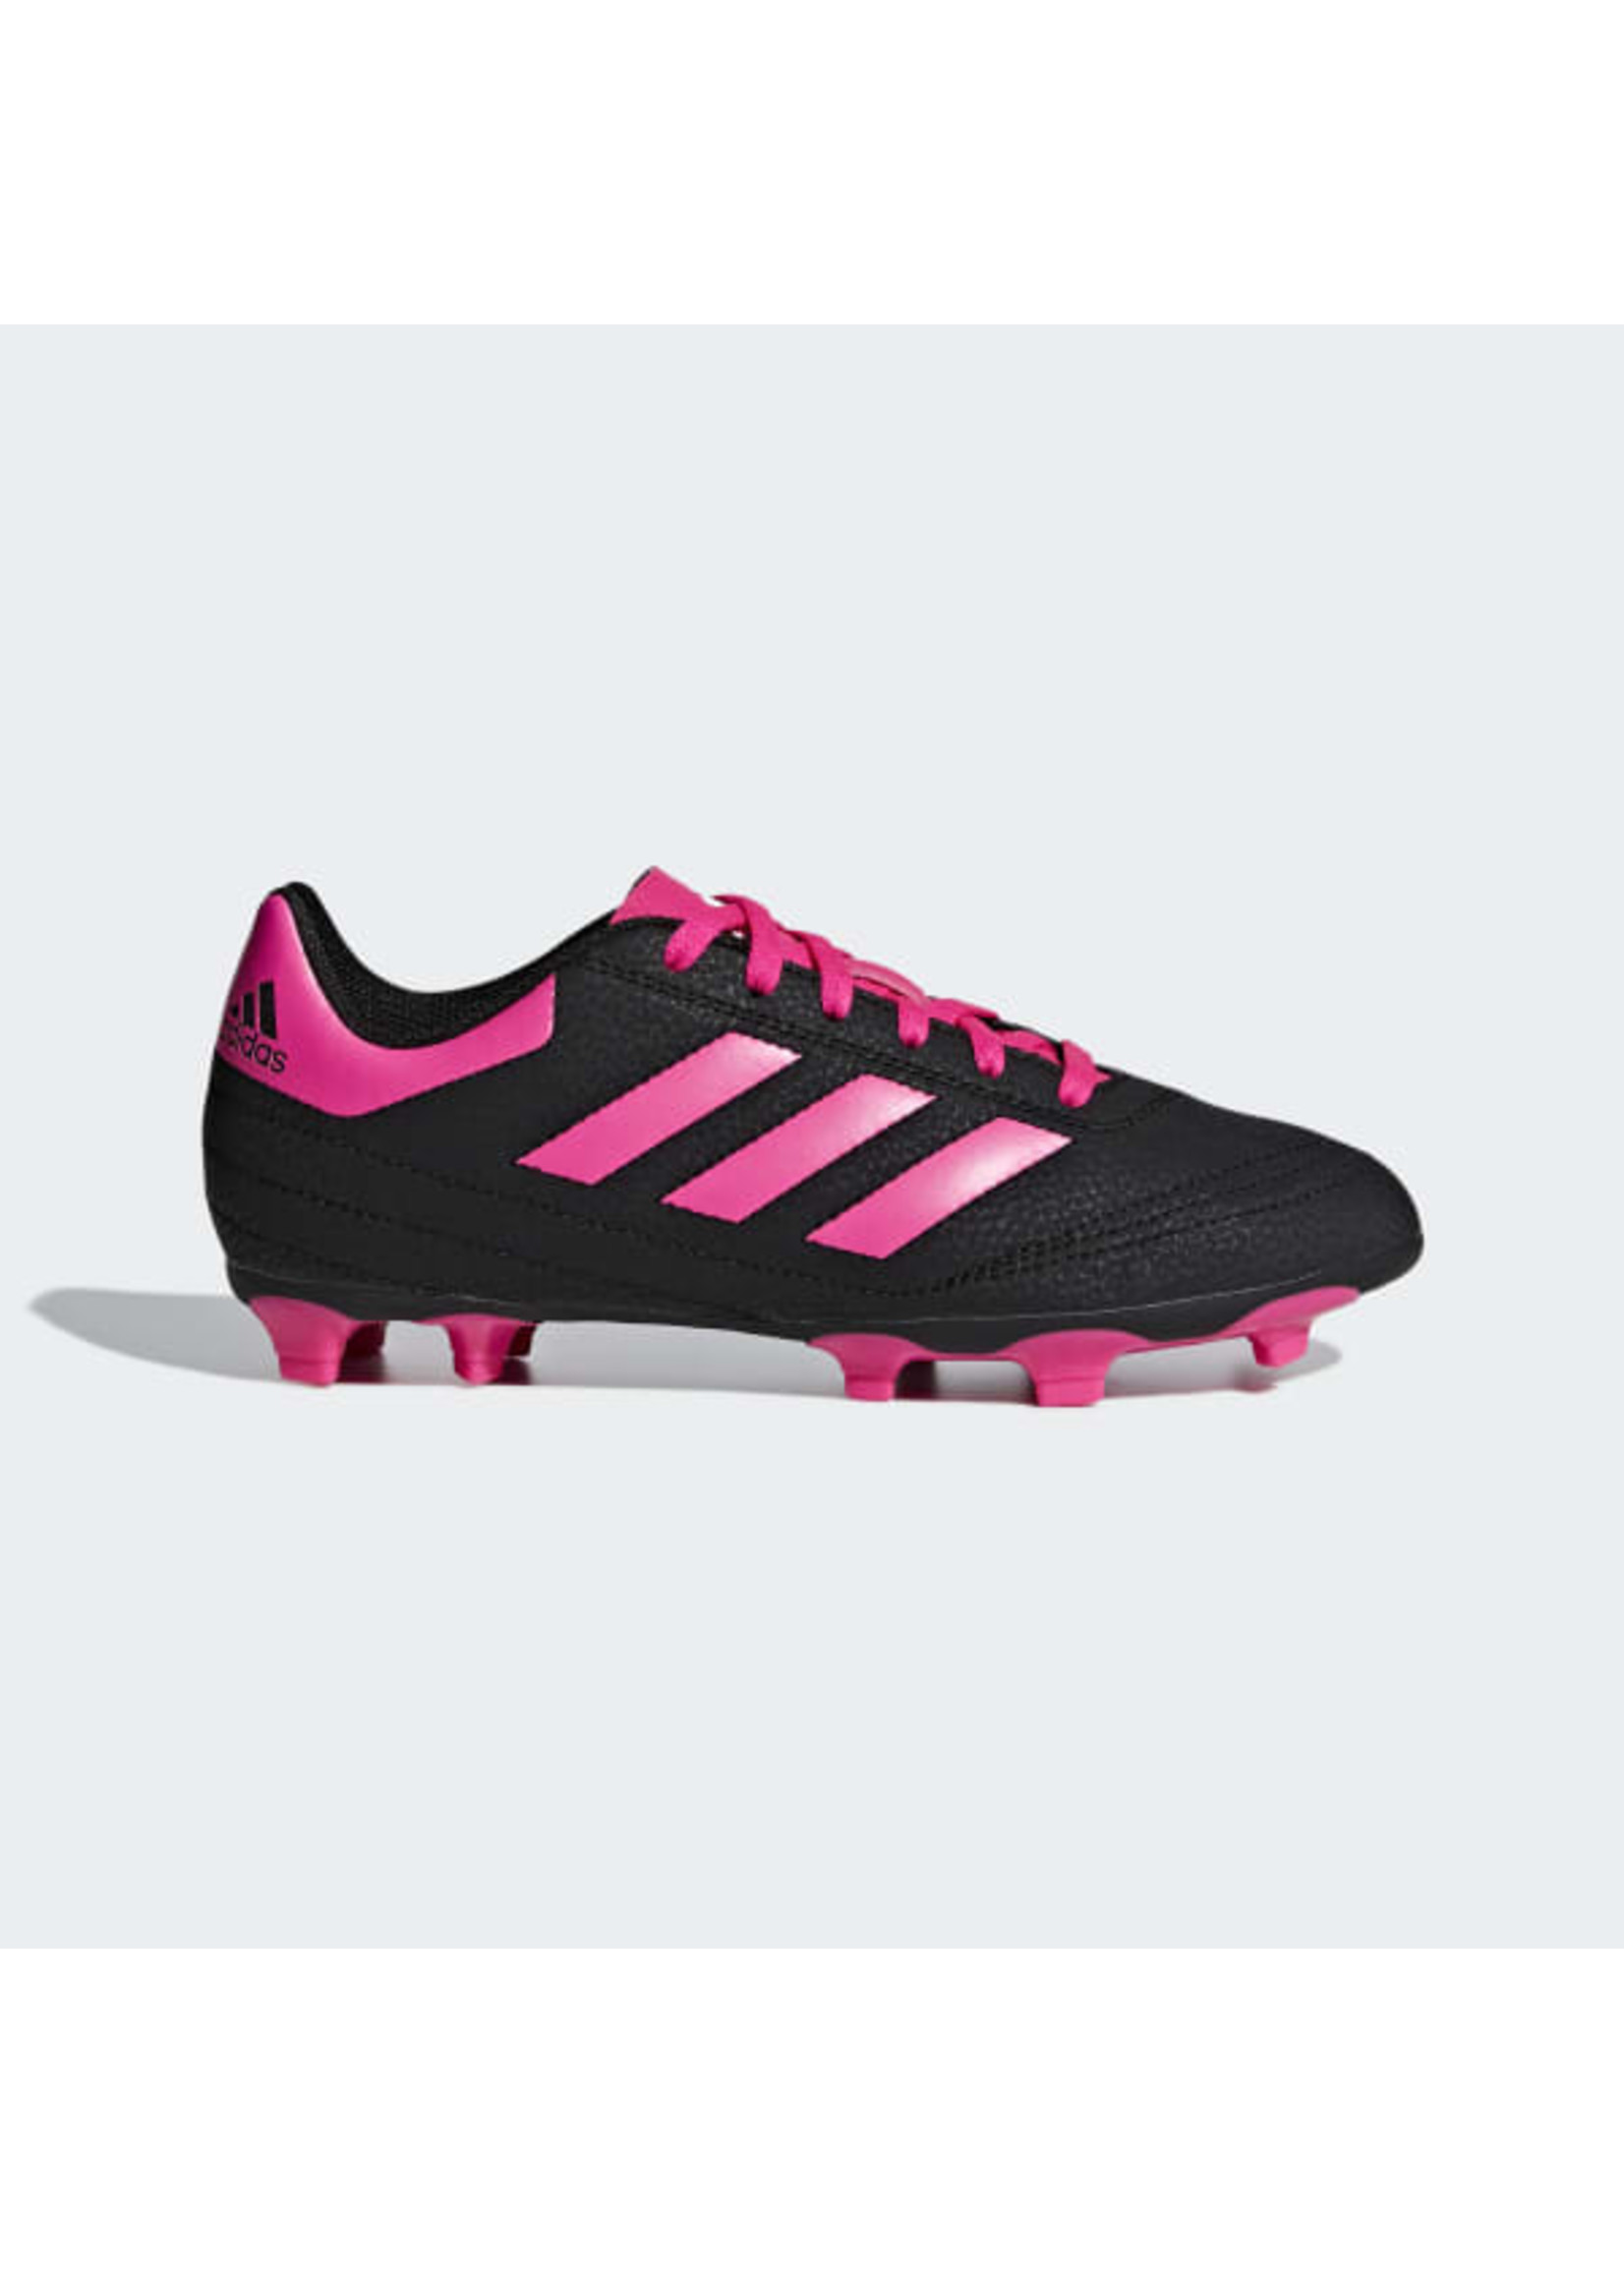 Adidas Goletto VI FG Jr G26368